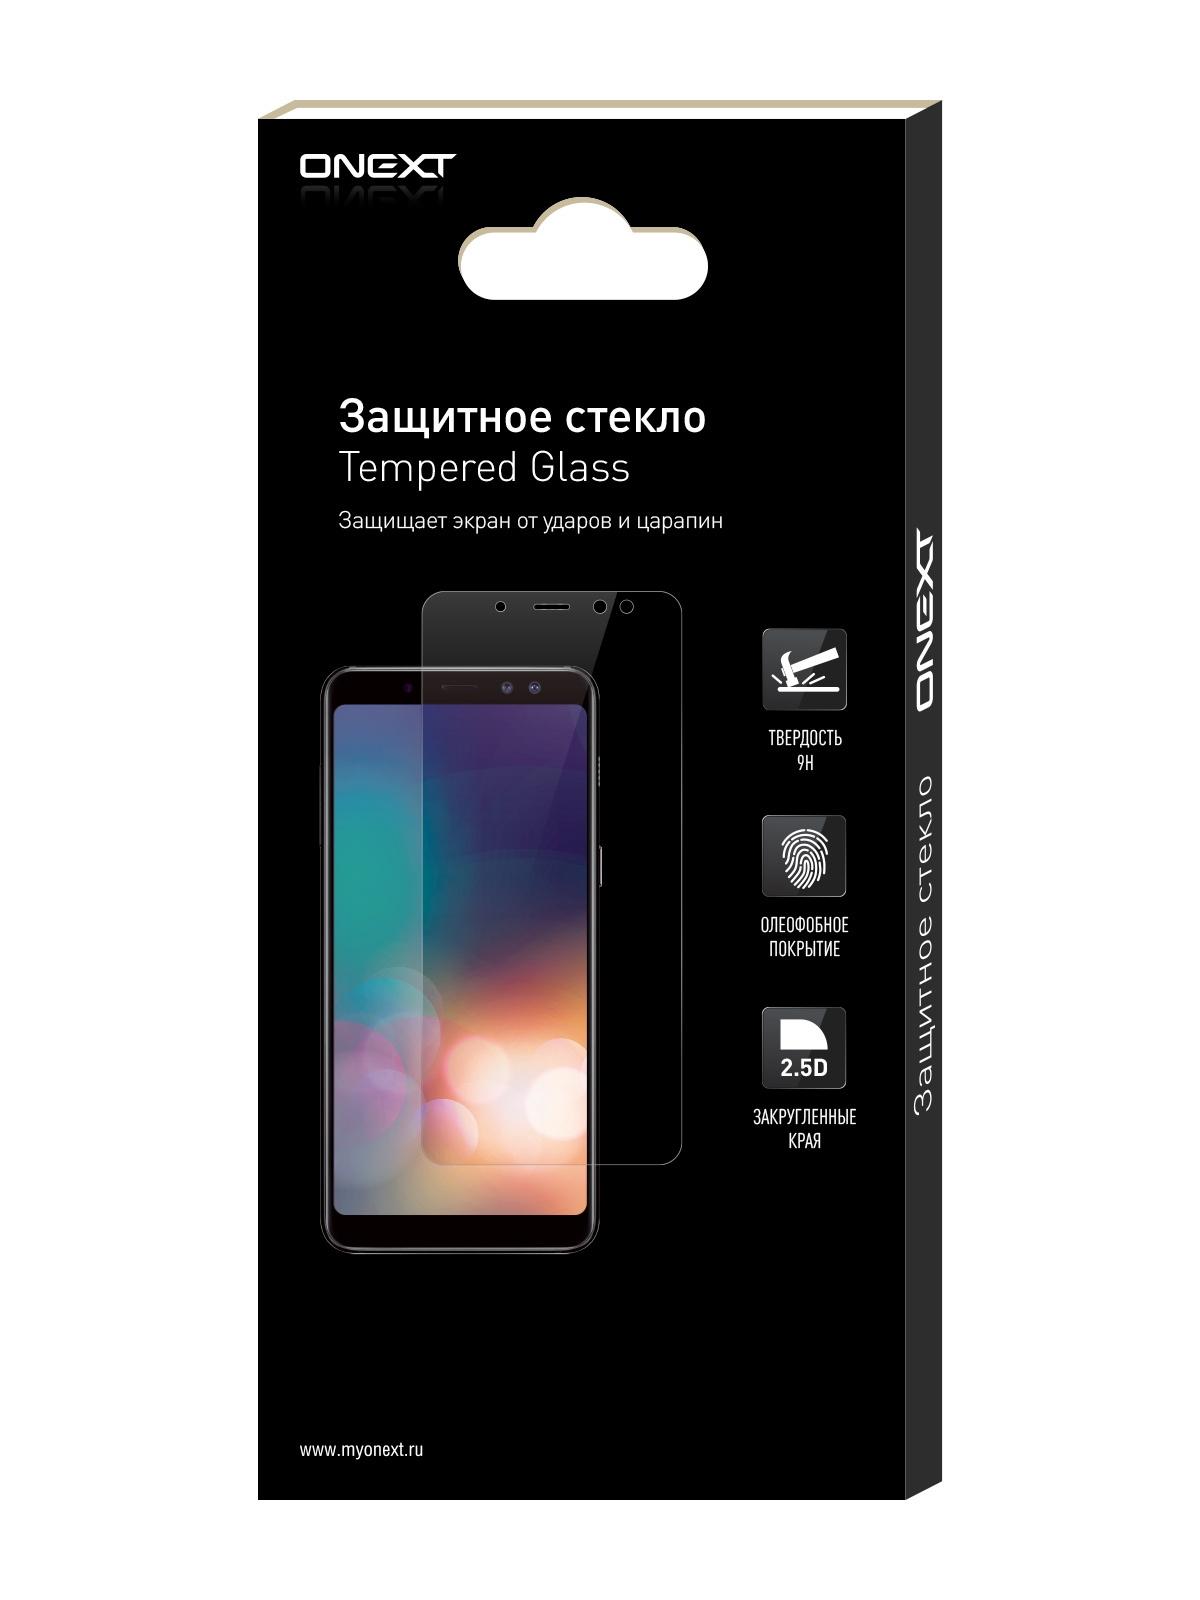 Защитное стекло ONEXT Samsung Galaxy A5 2016 цена